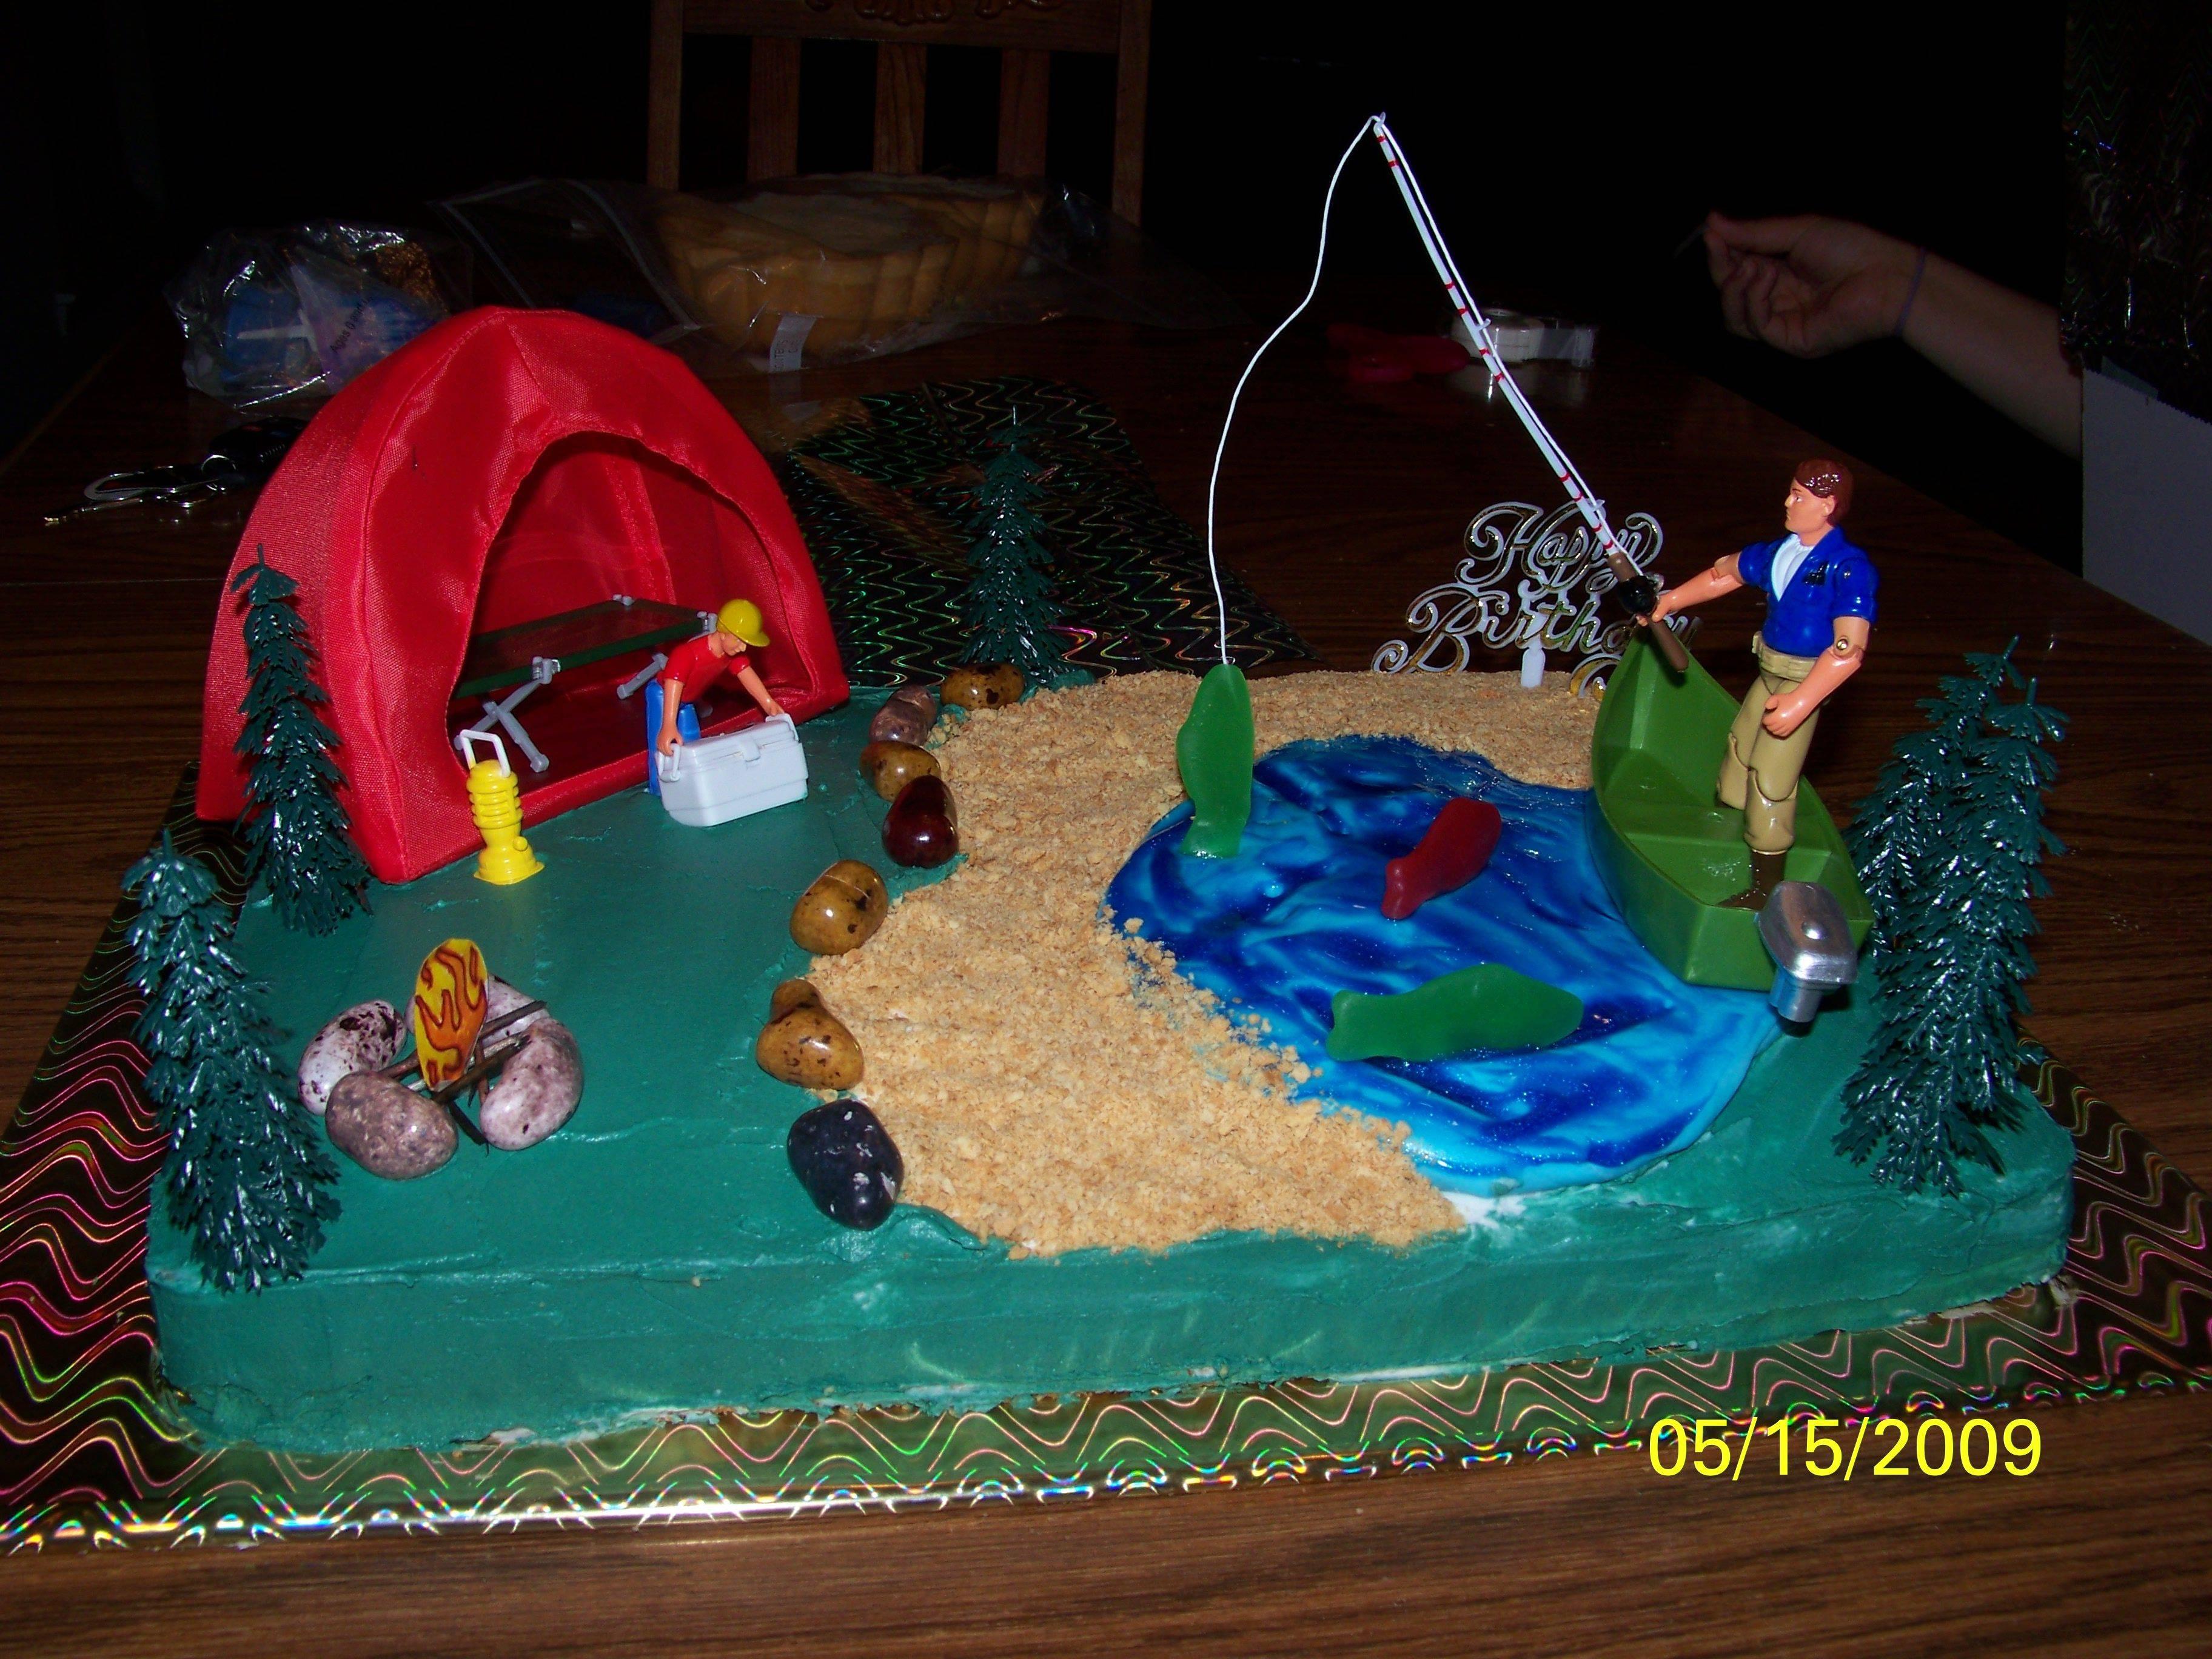 Cake Decorations Fishing Theme : Fishing Cakes   Decoration Ideas Little Birthday Cakes